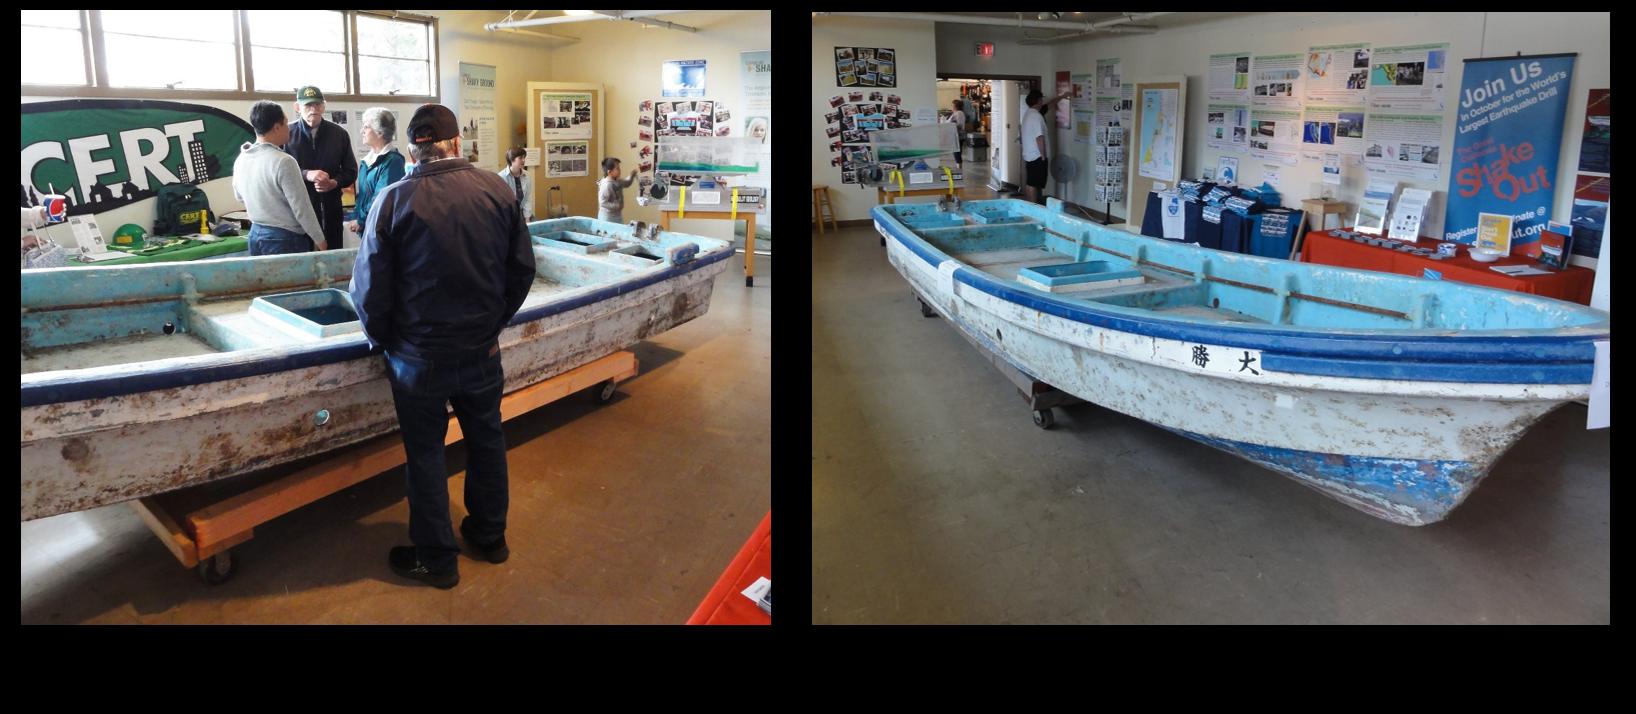 Photos of the Tai Shu Maru at the Humboldt County Fair